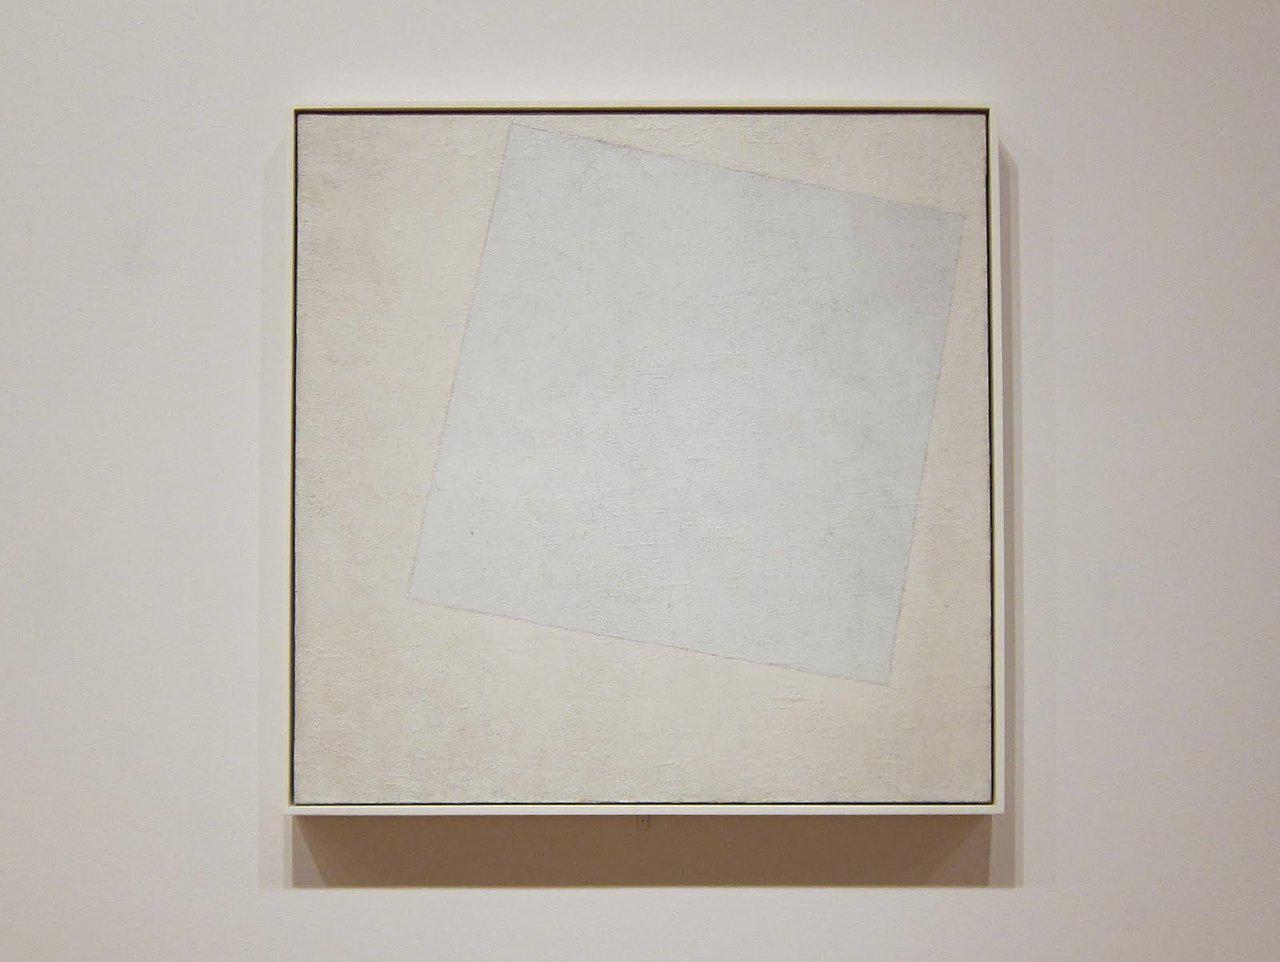 """Blanco sobre blanco"" (1918) de Kazimir Malevich"